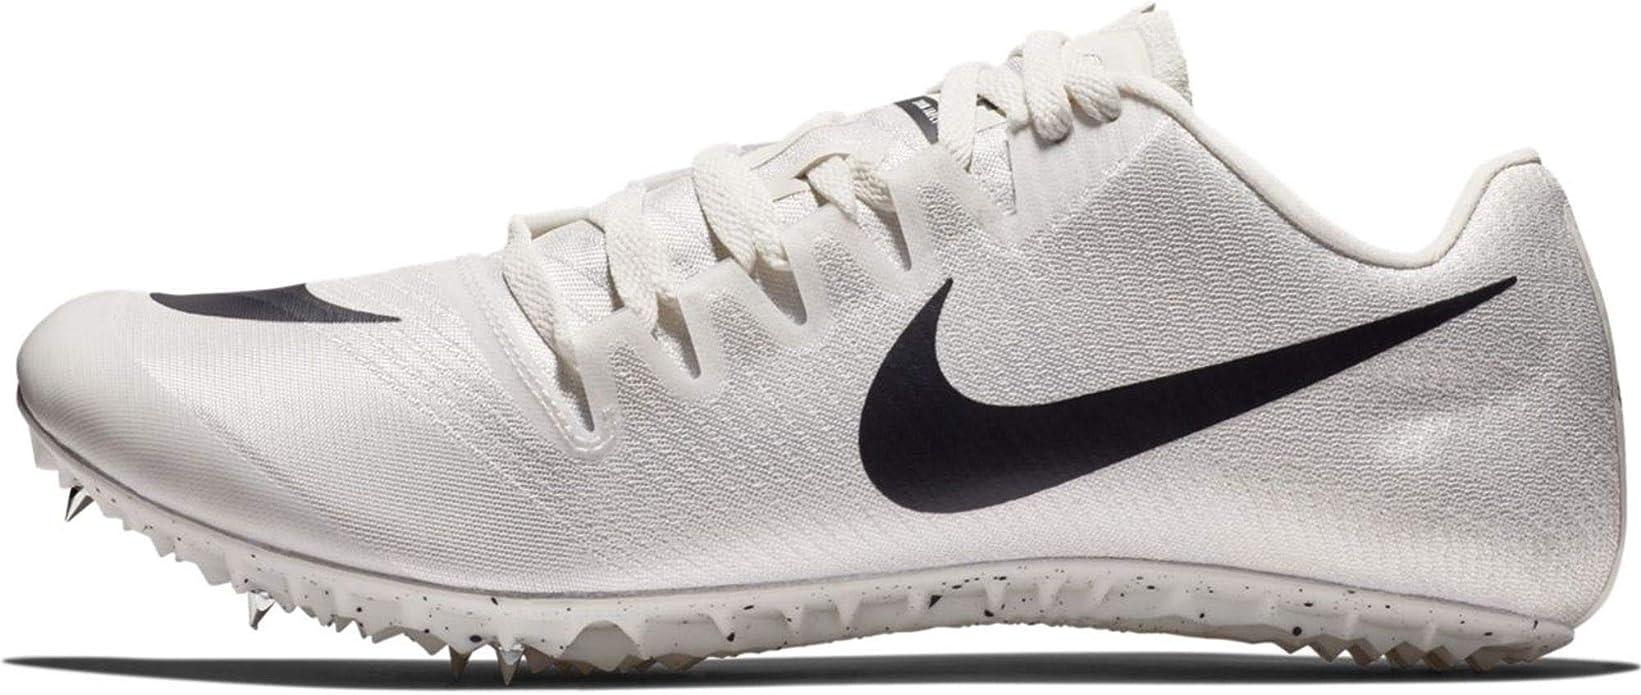 Nike Zoom Ja Fly 3 Mens 865633-001 Size